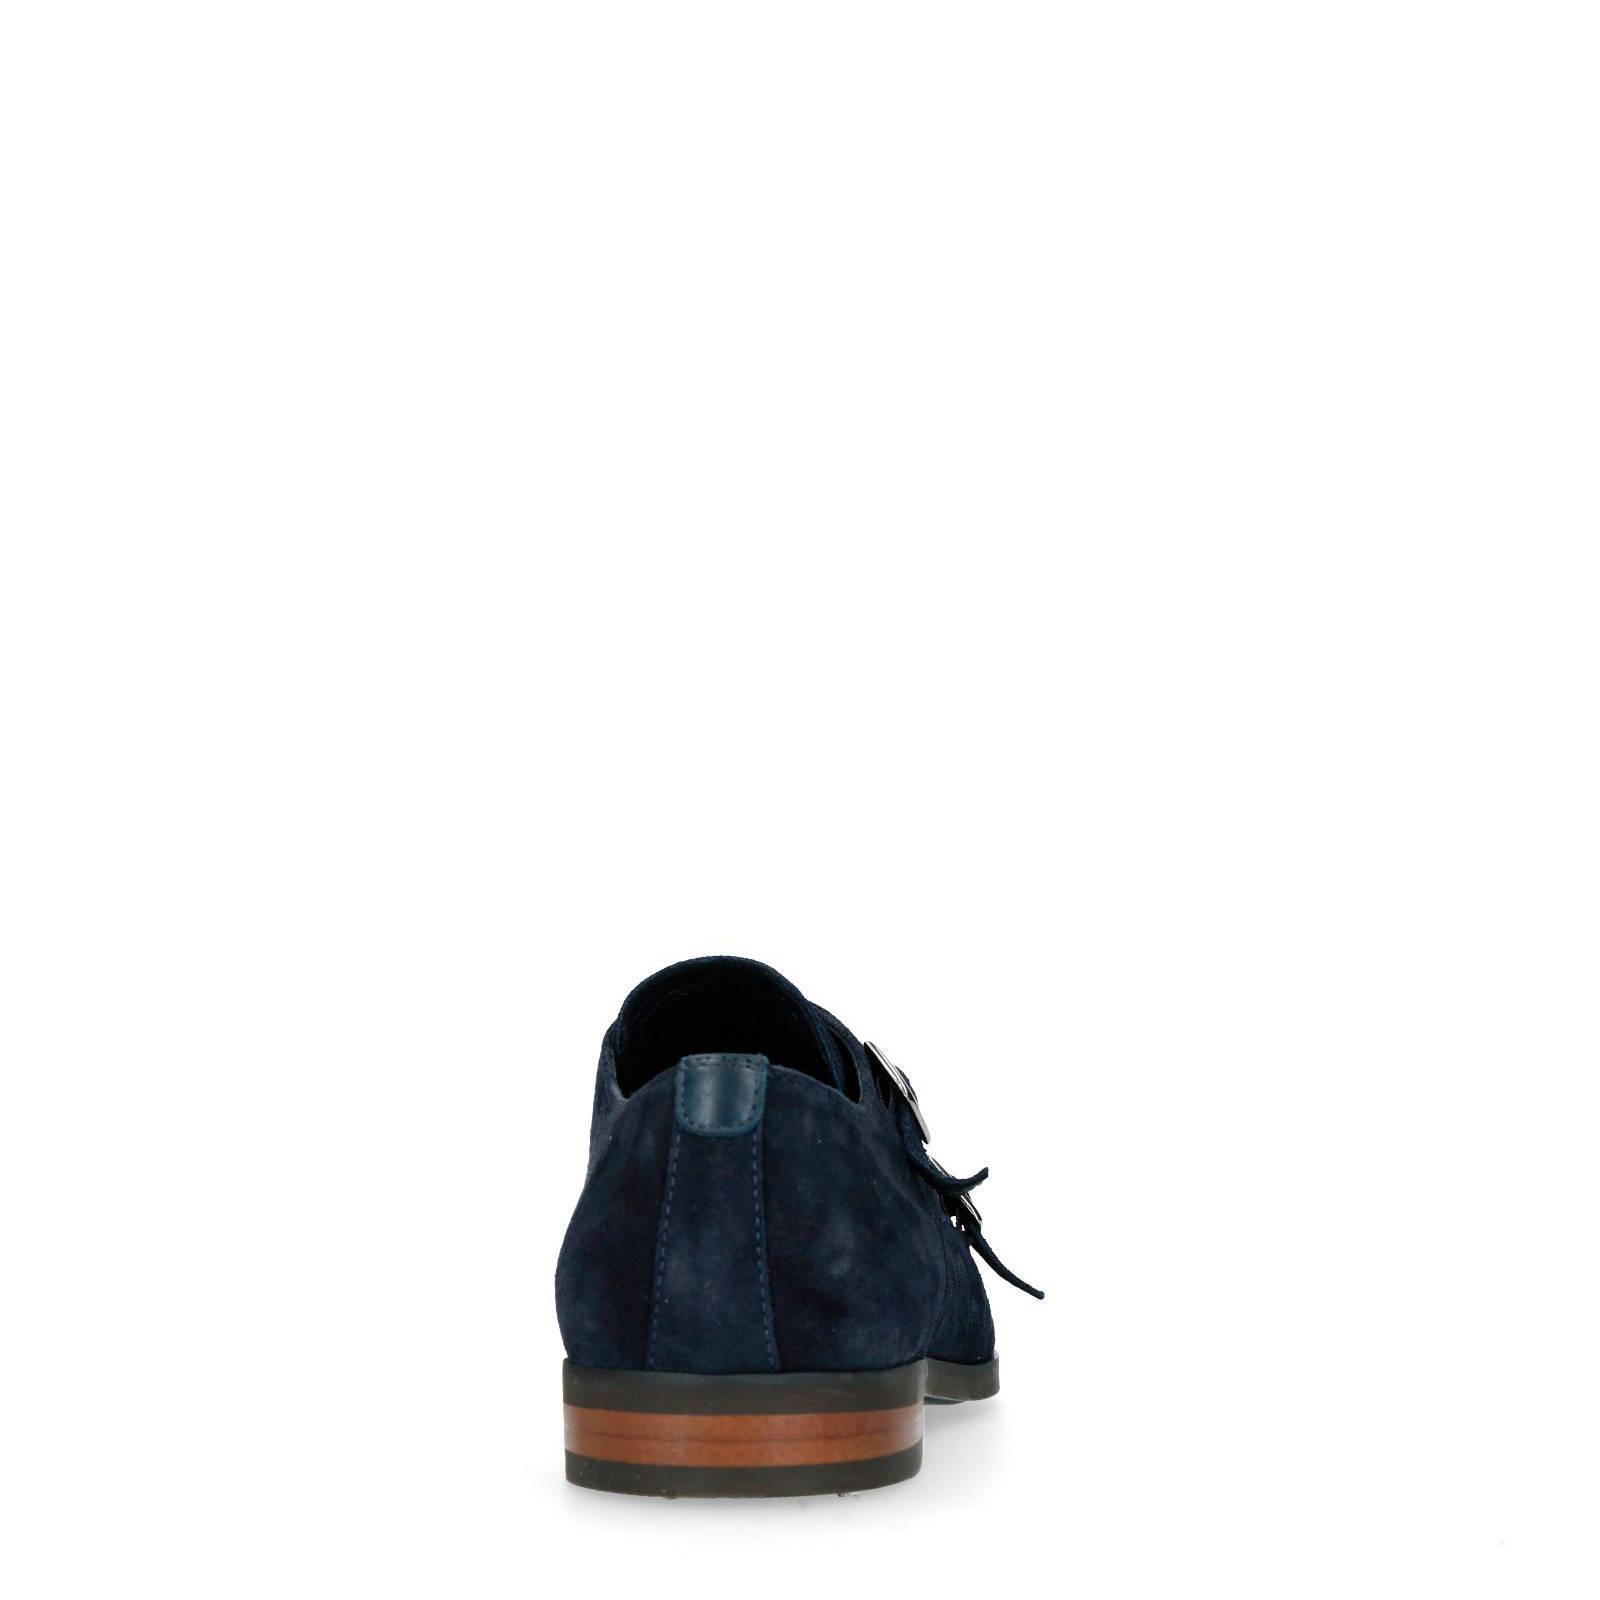 Manfield suède gespschoenen donkerblauw